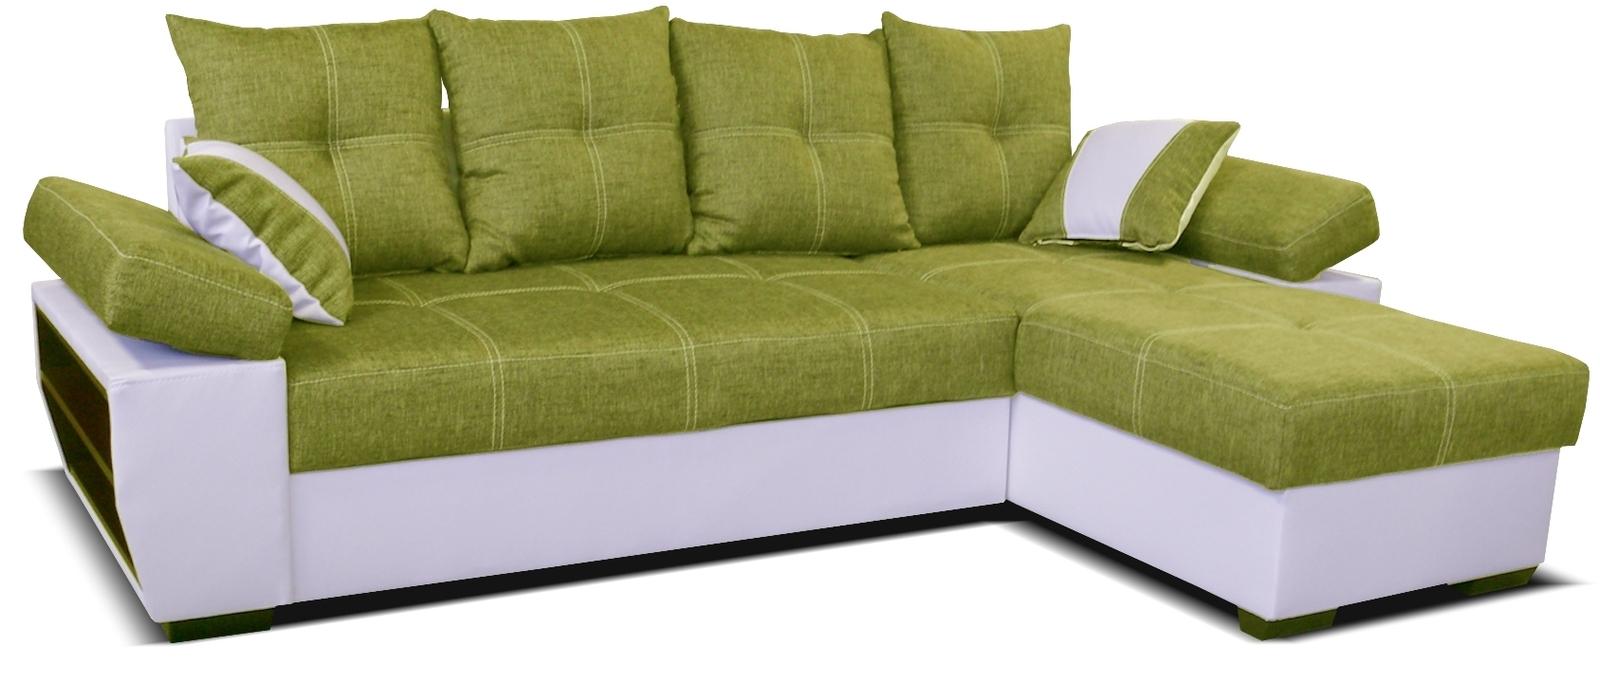 Rohová sedací souprava - Po-Sed - Viena 2F+L (P) bílá + zelená